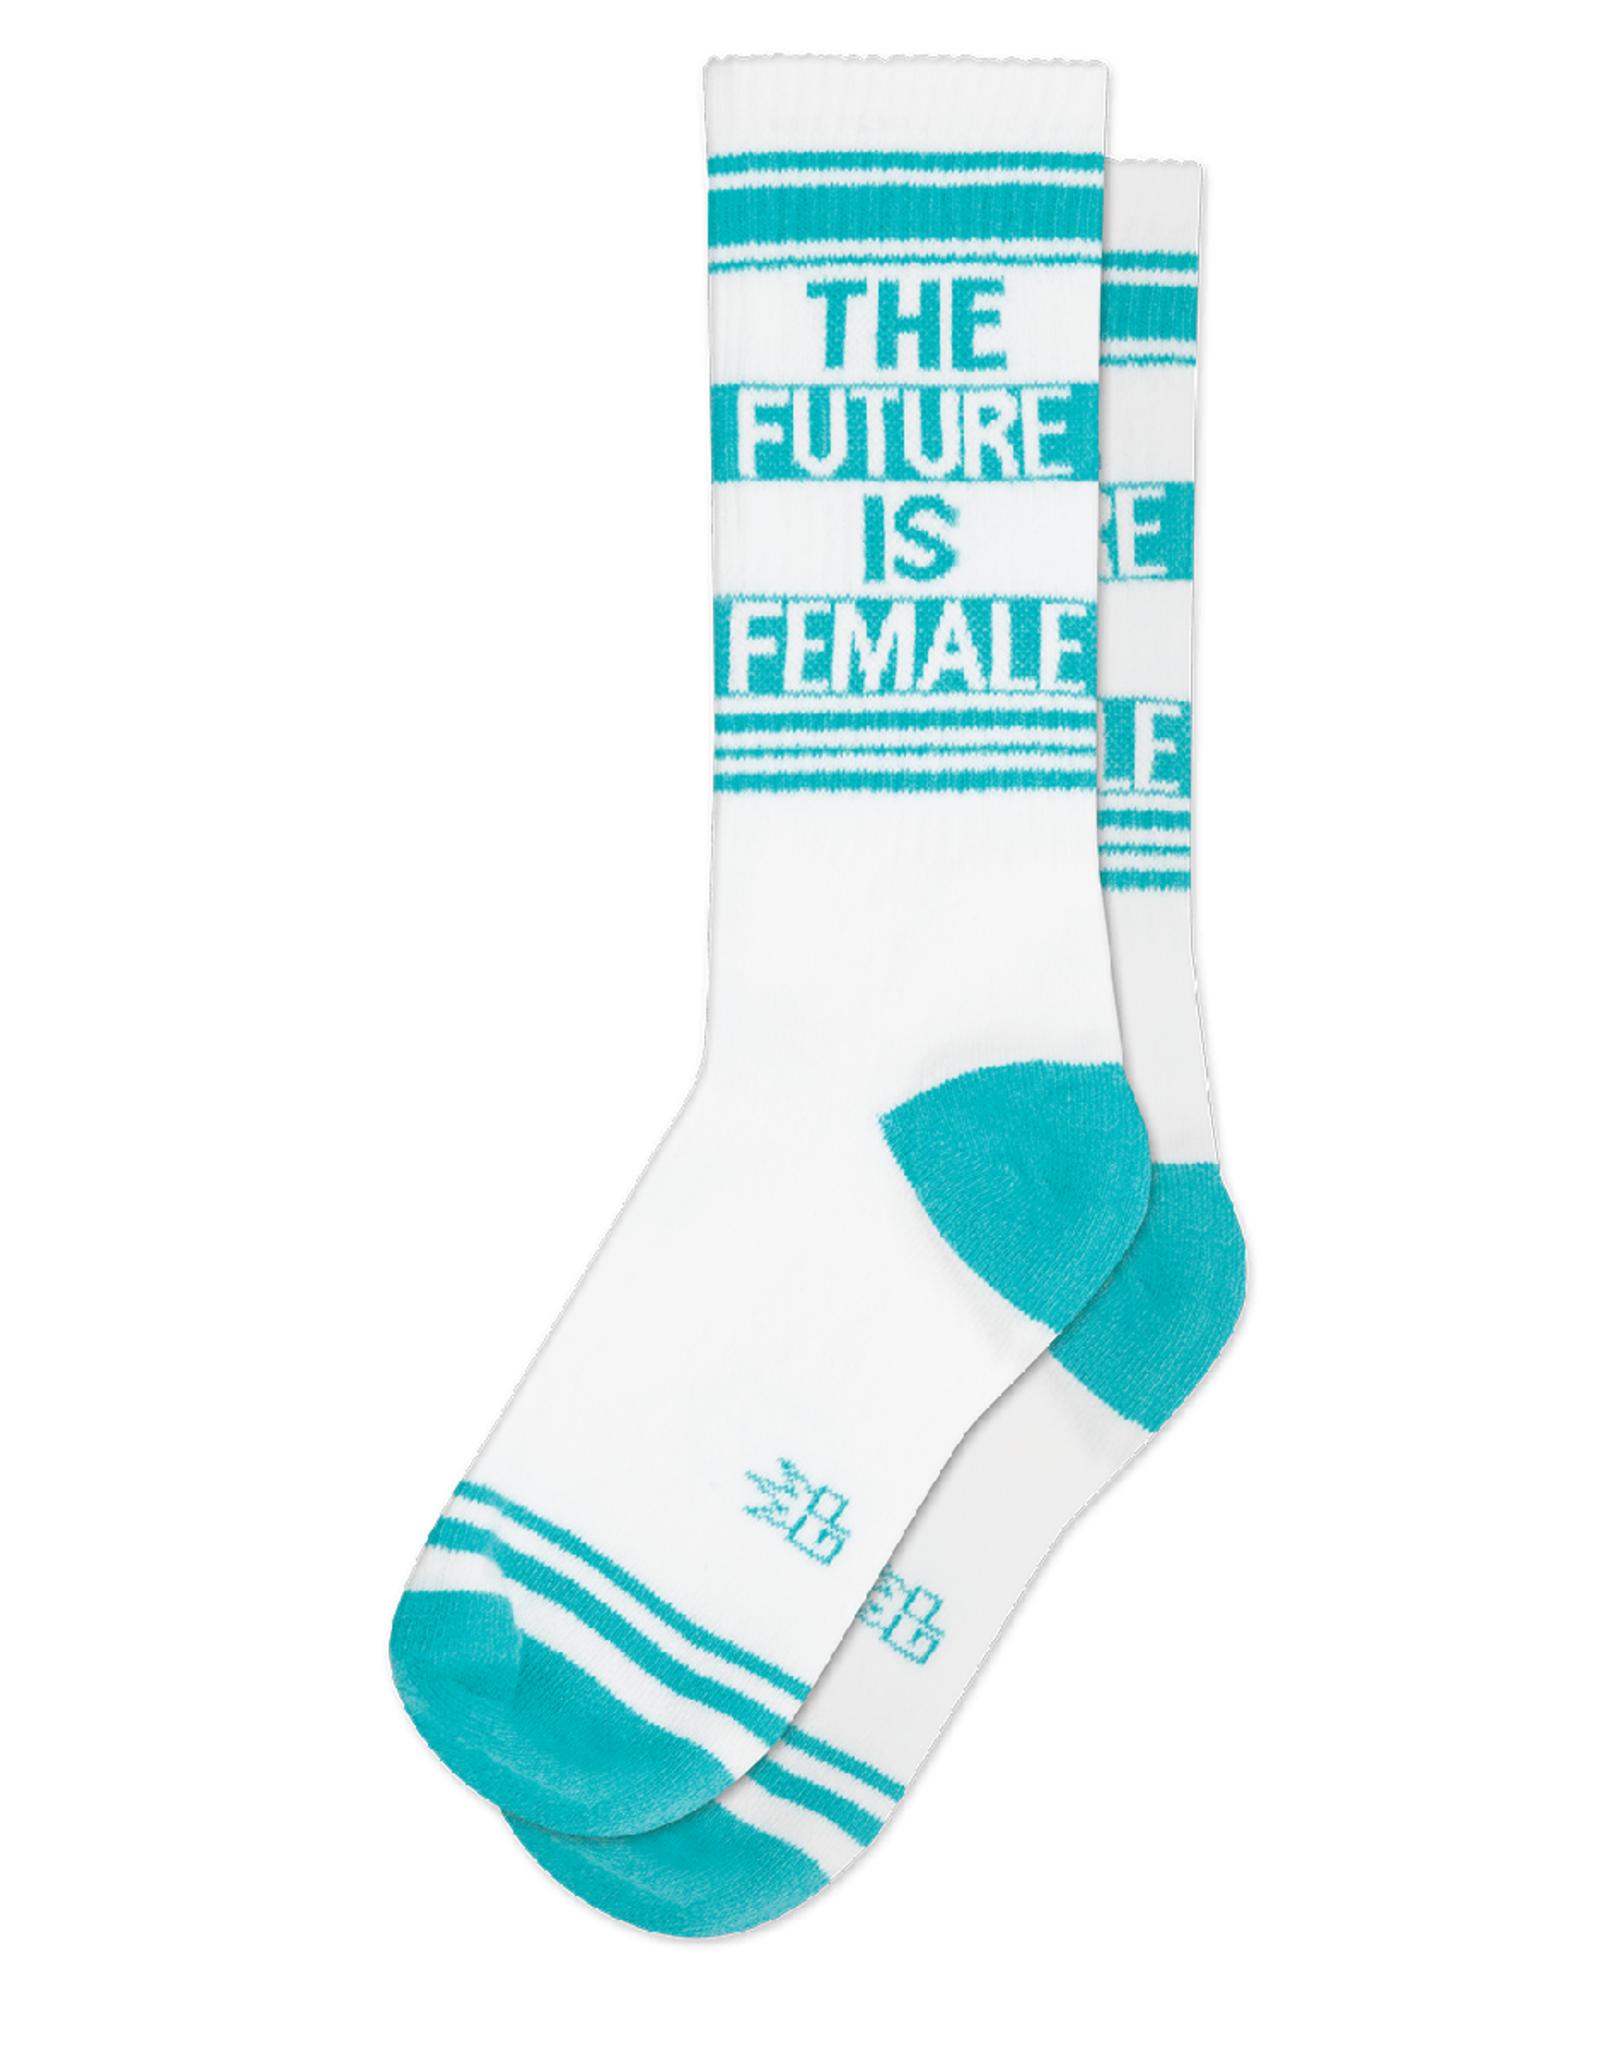 The Future Is Female Socks